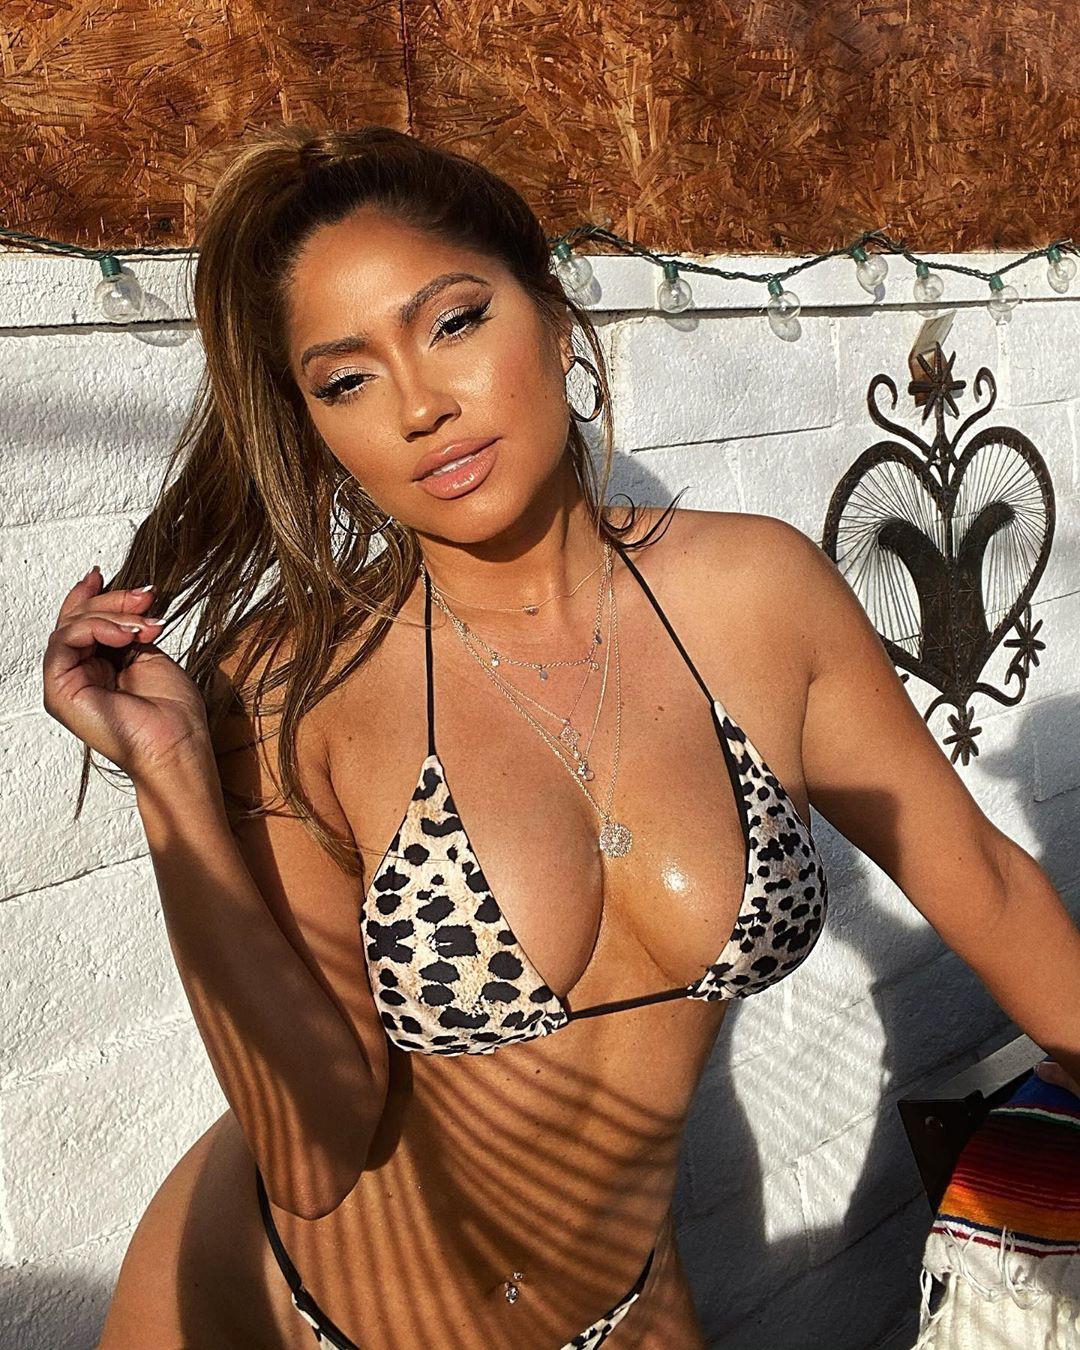 Jessica Burciaga lingerie, bikini swimwear outfits for girls